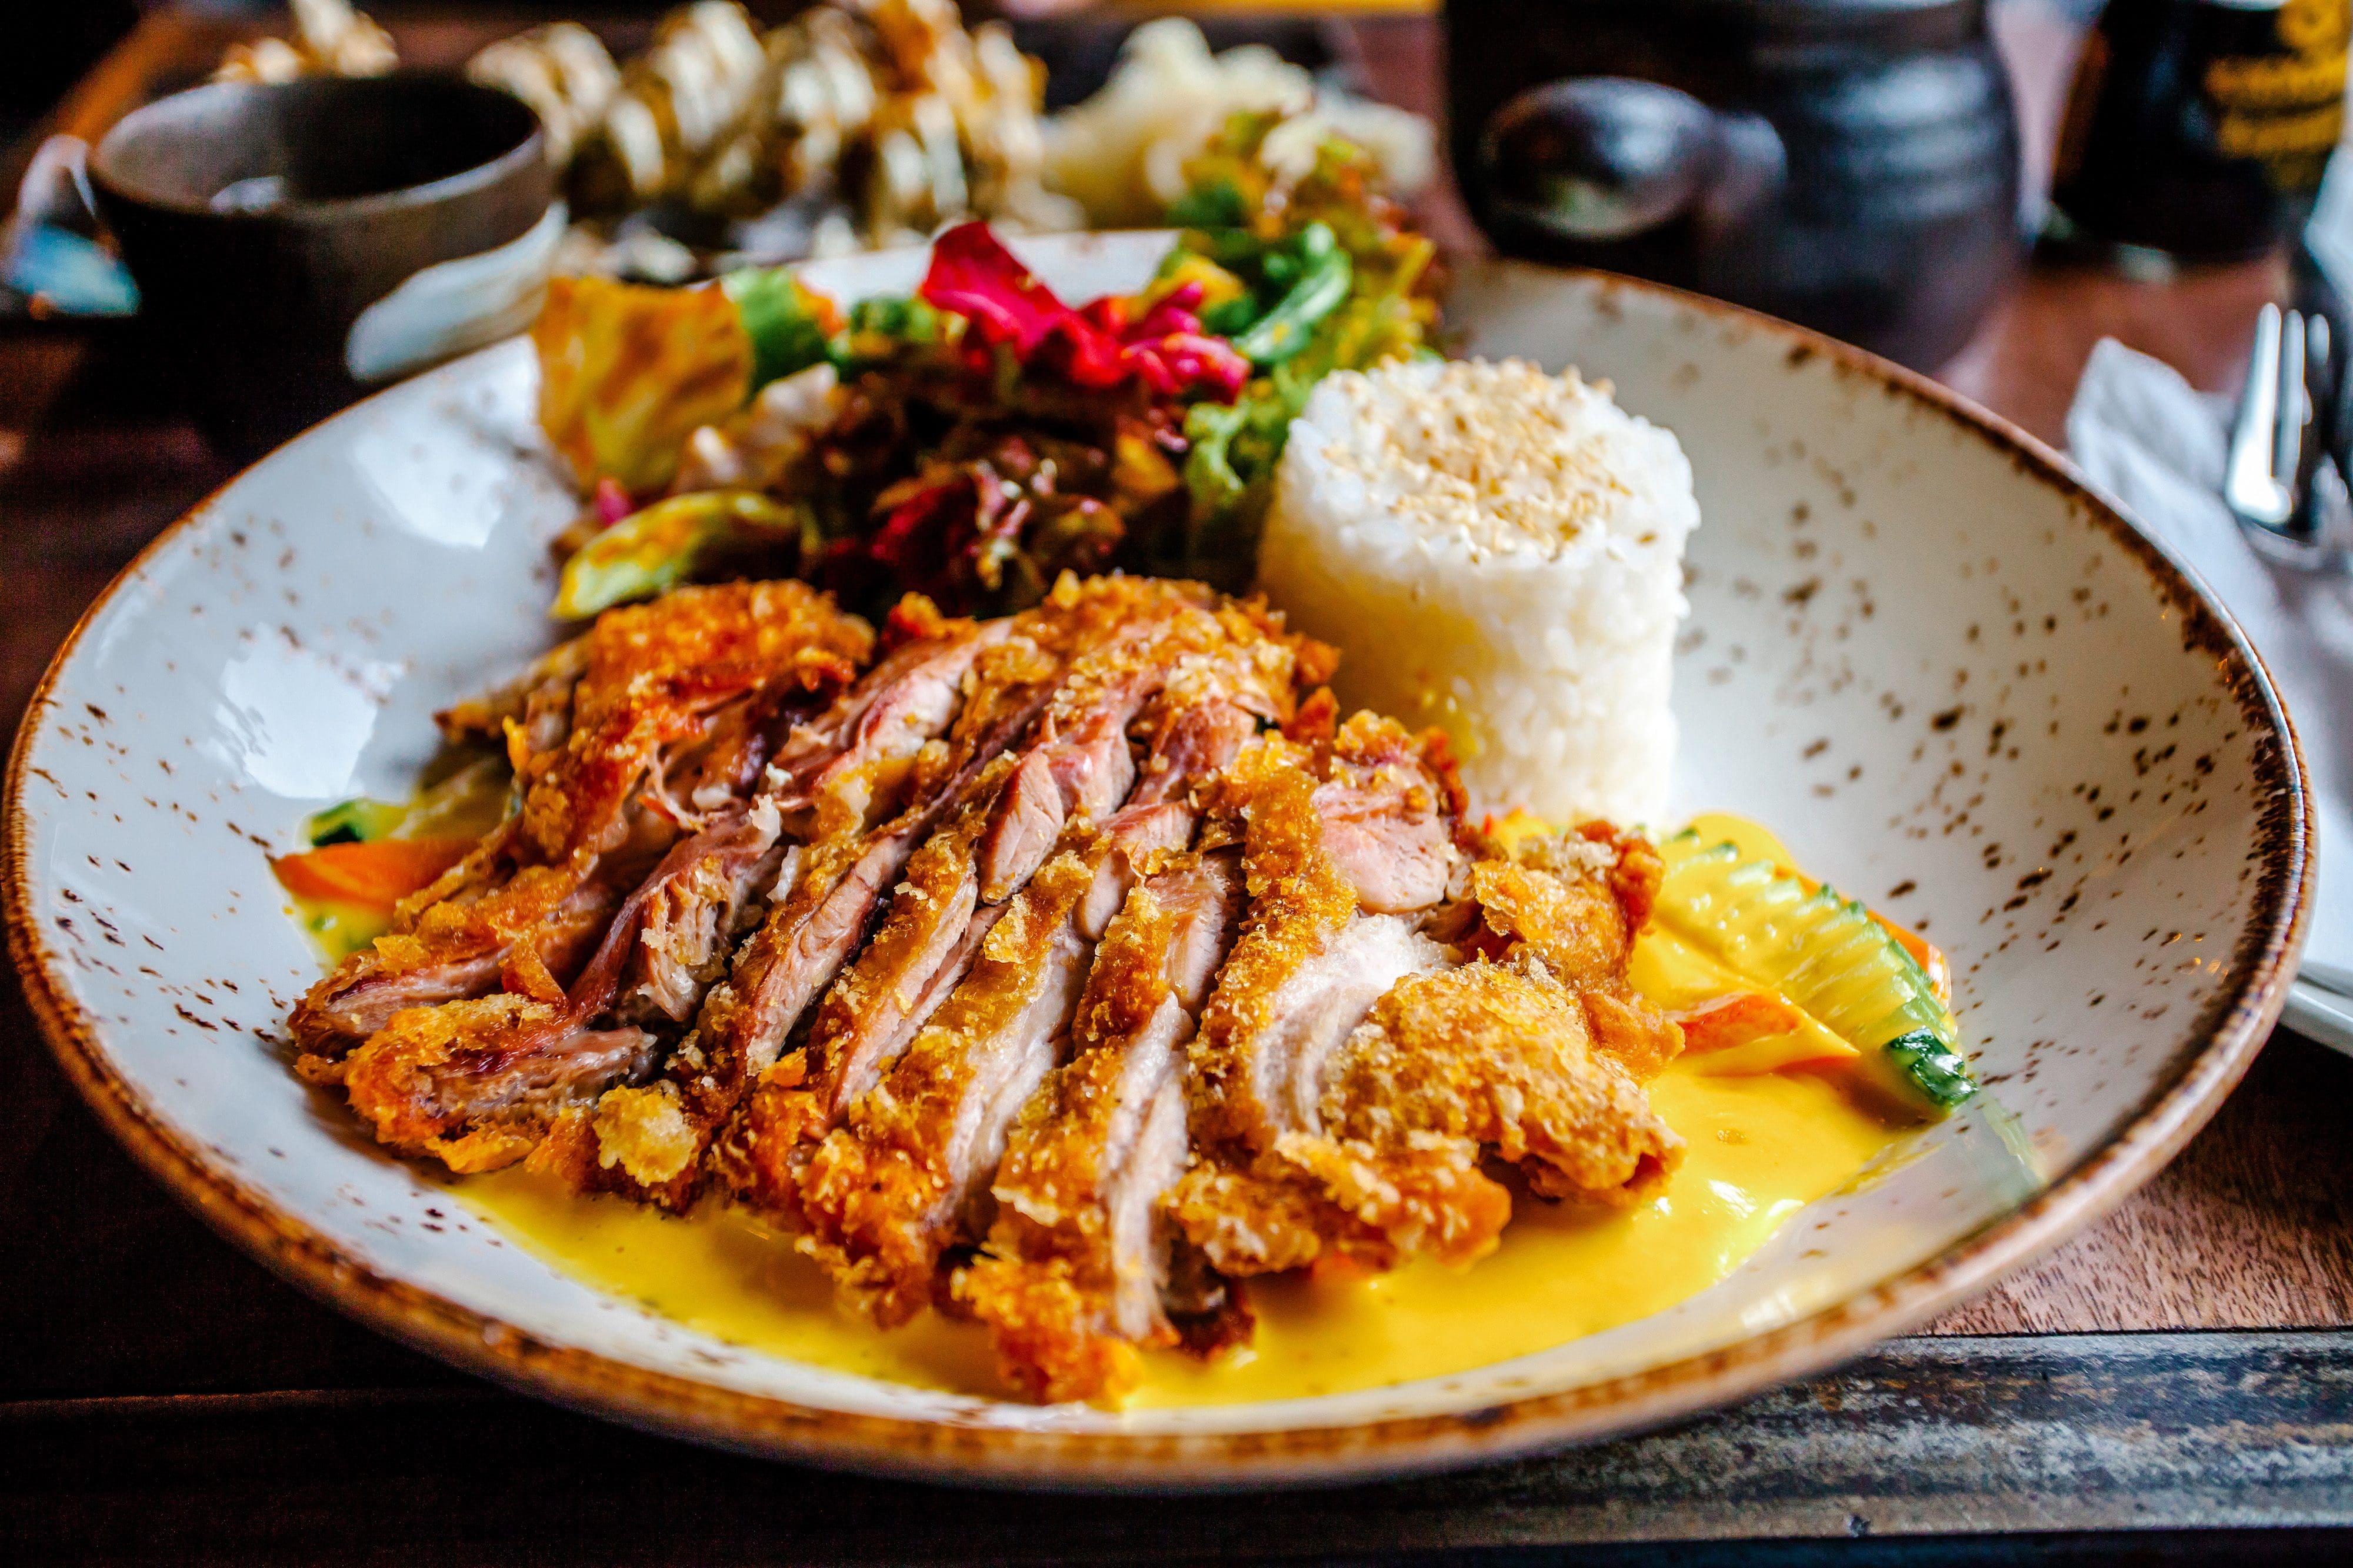 Macanese dish